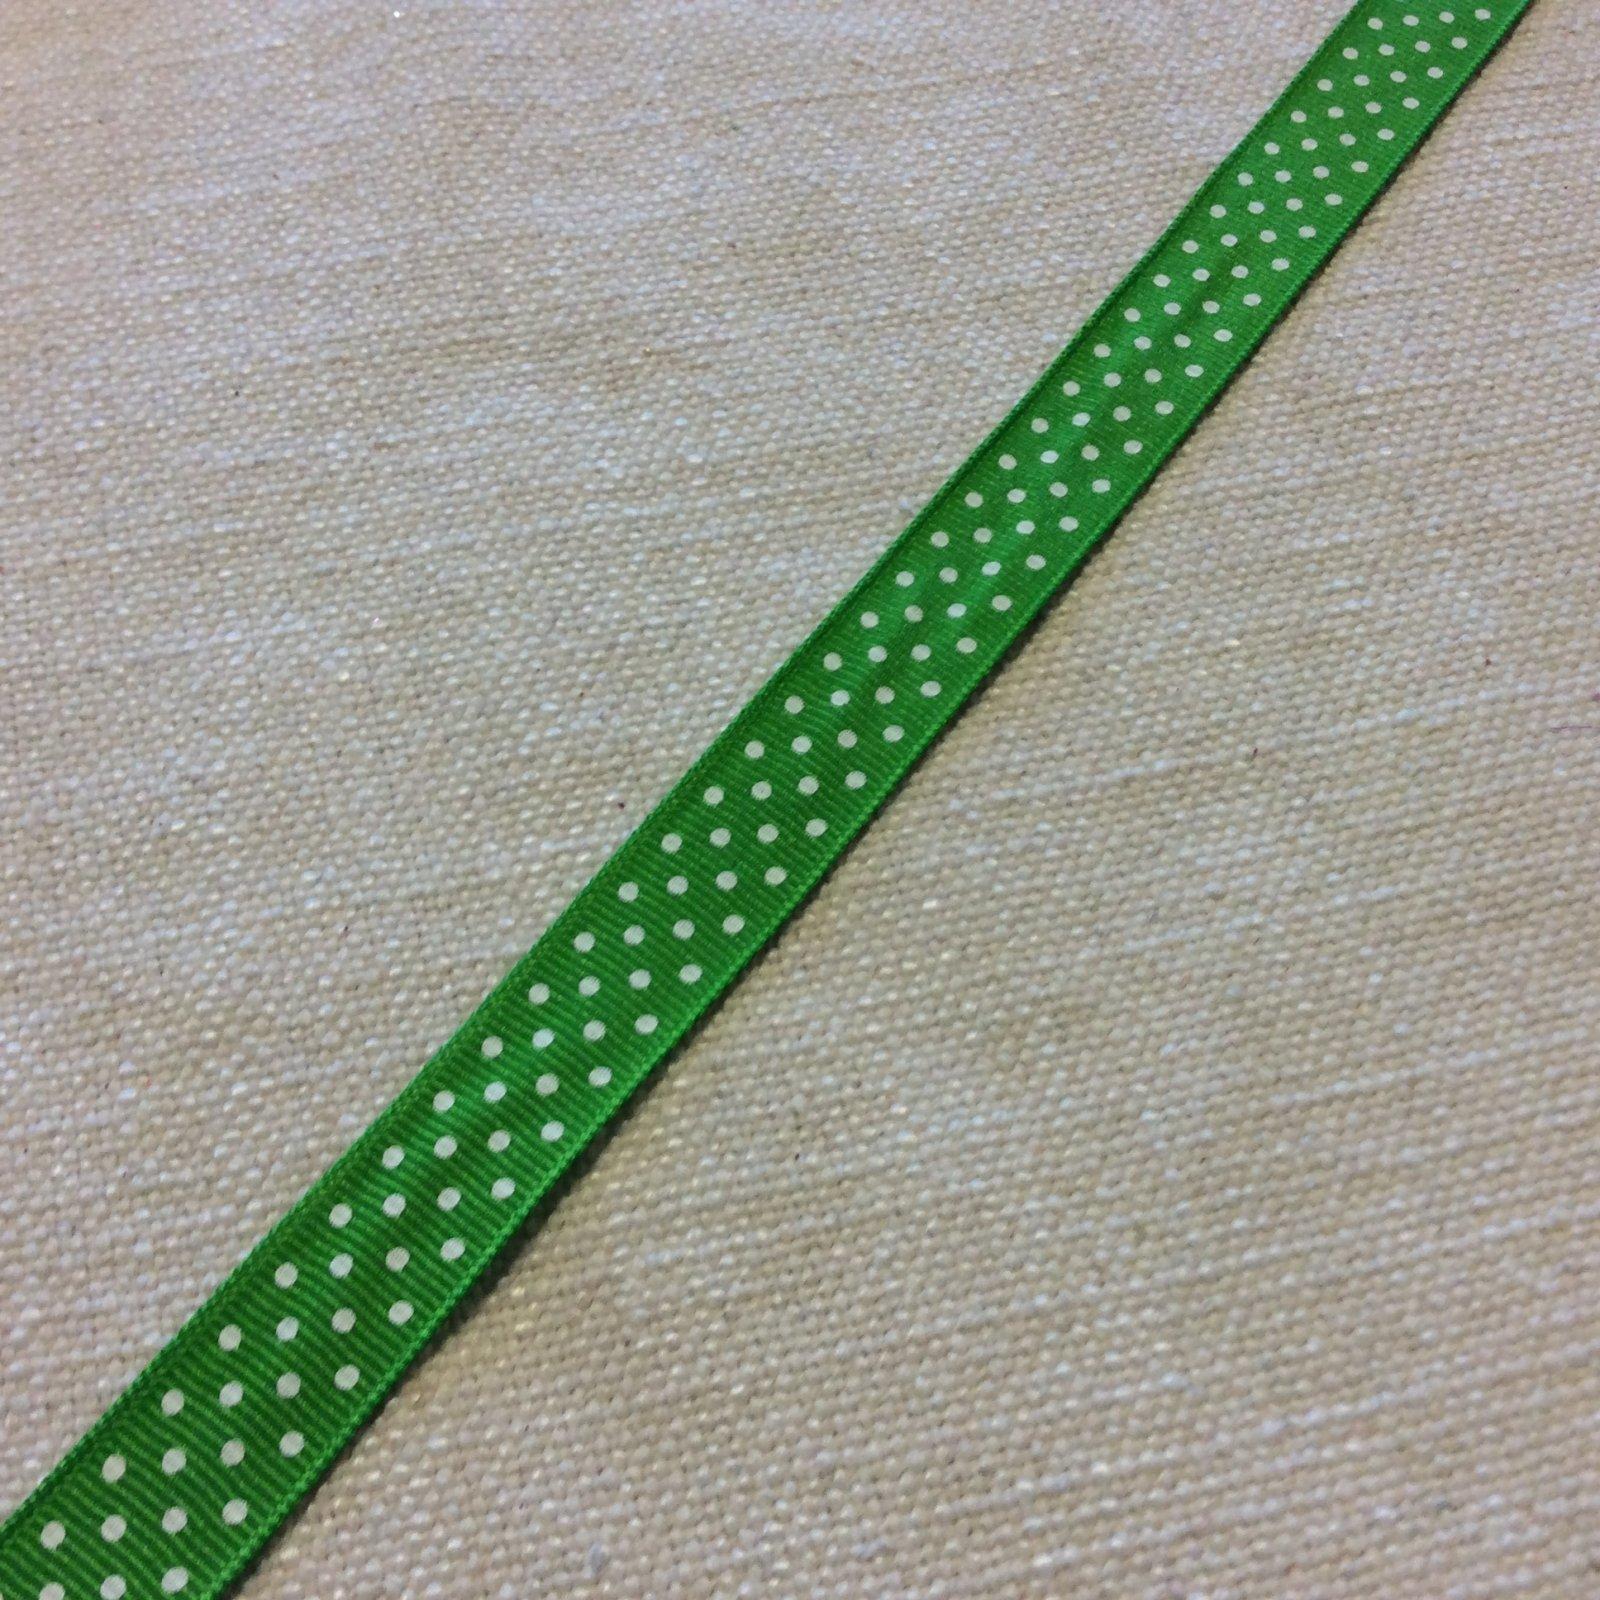 Grosgrain Ribbon Green White Polka Dot 5/8 Trim Ribbon RIB1117